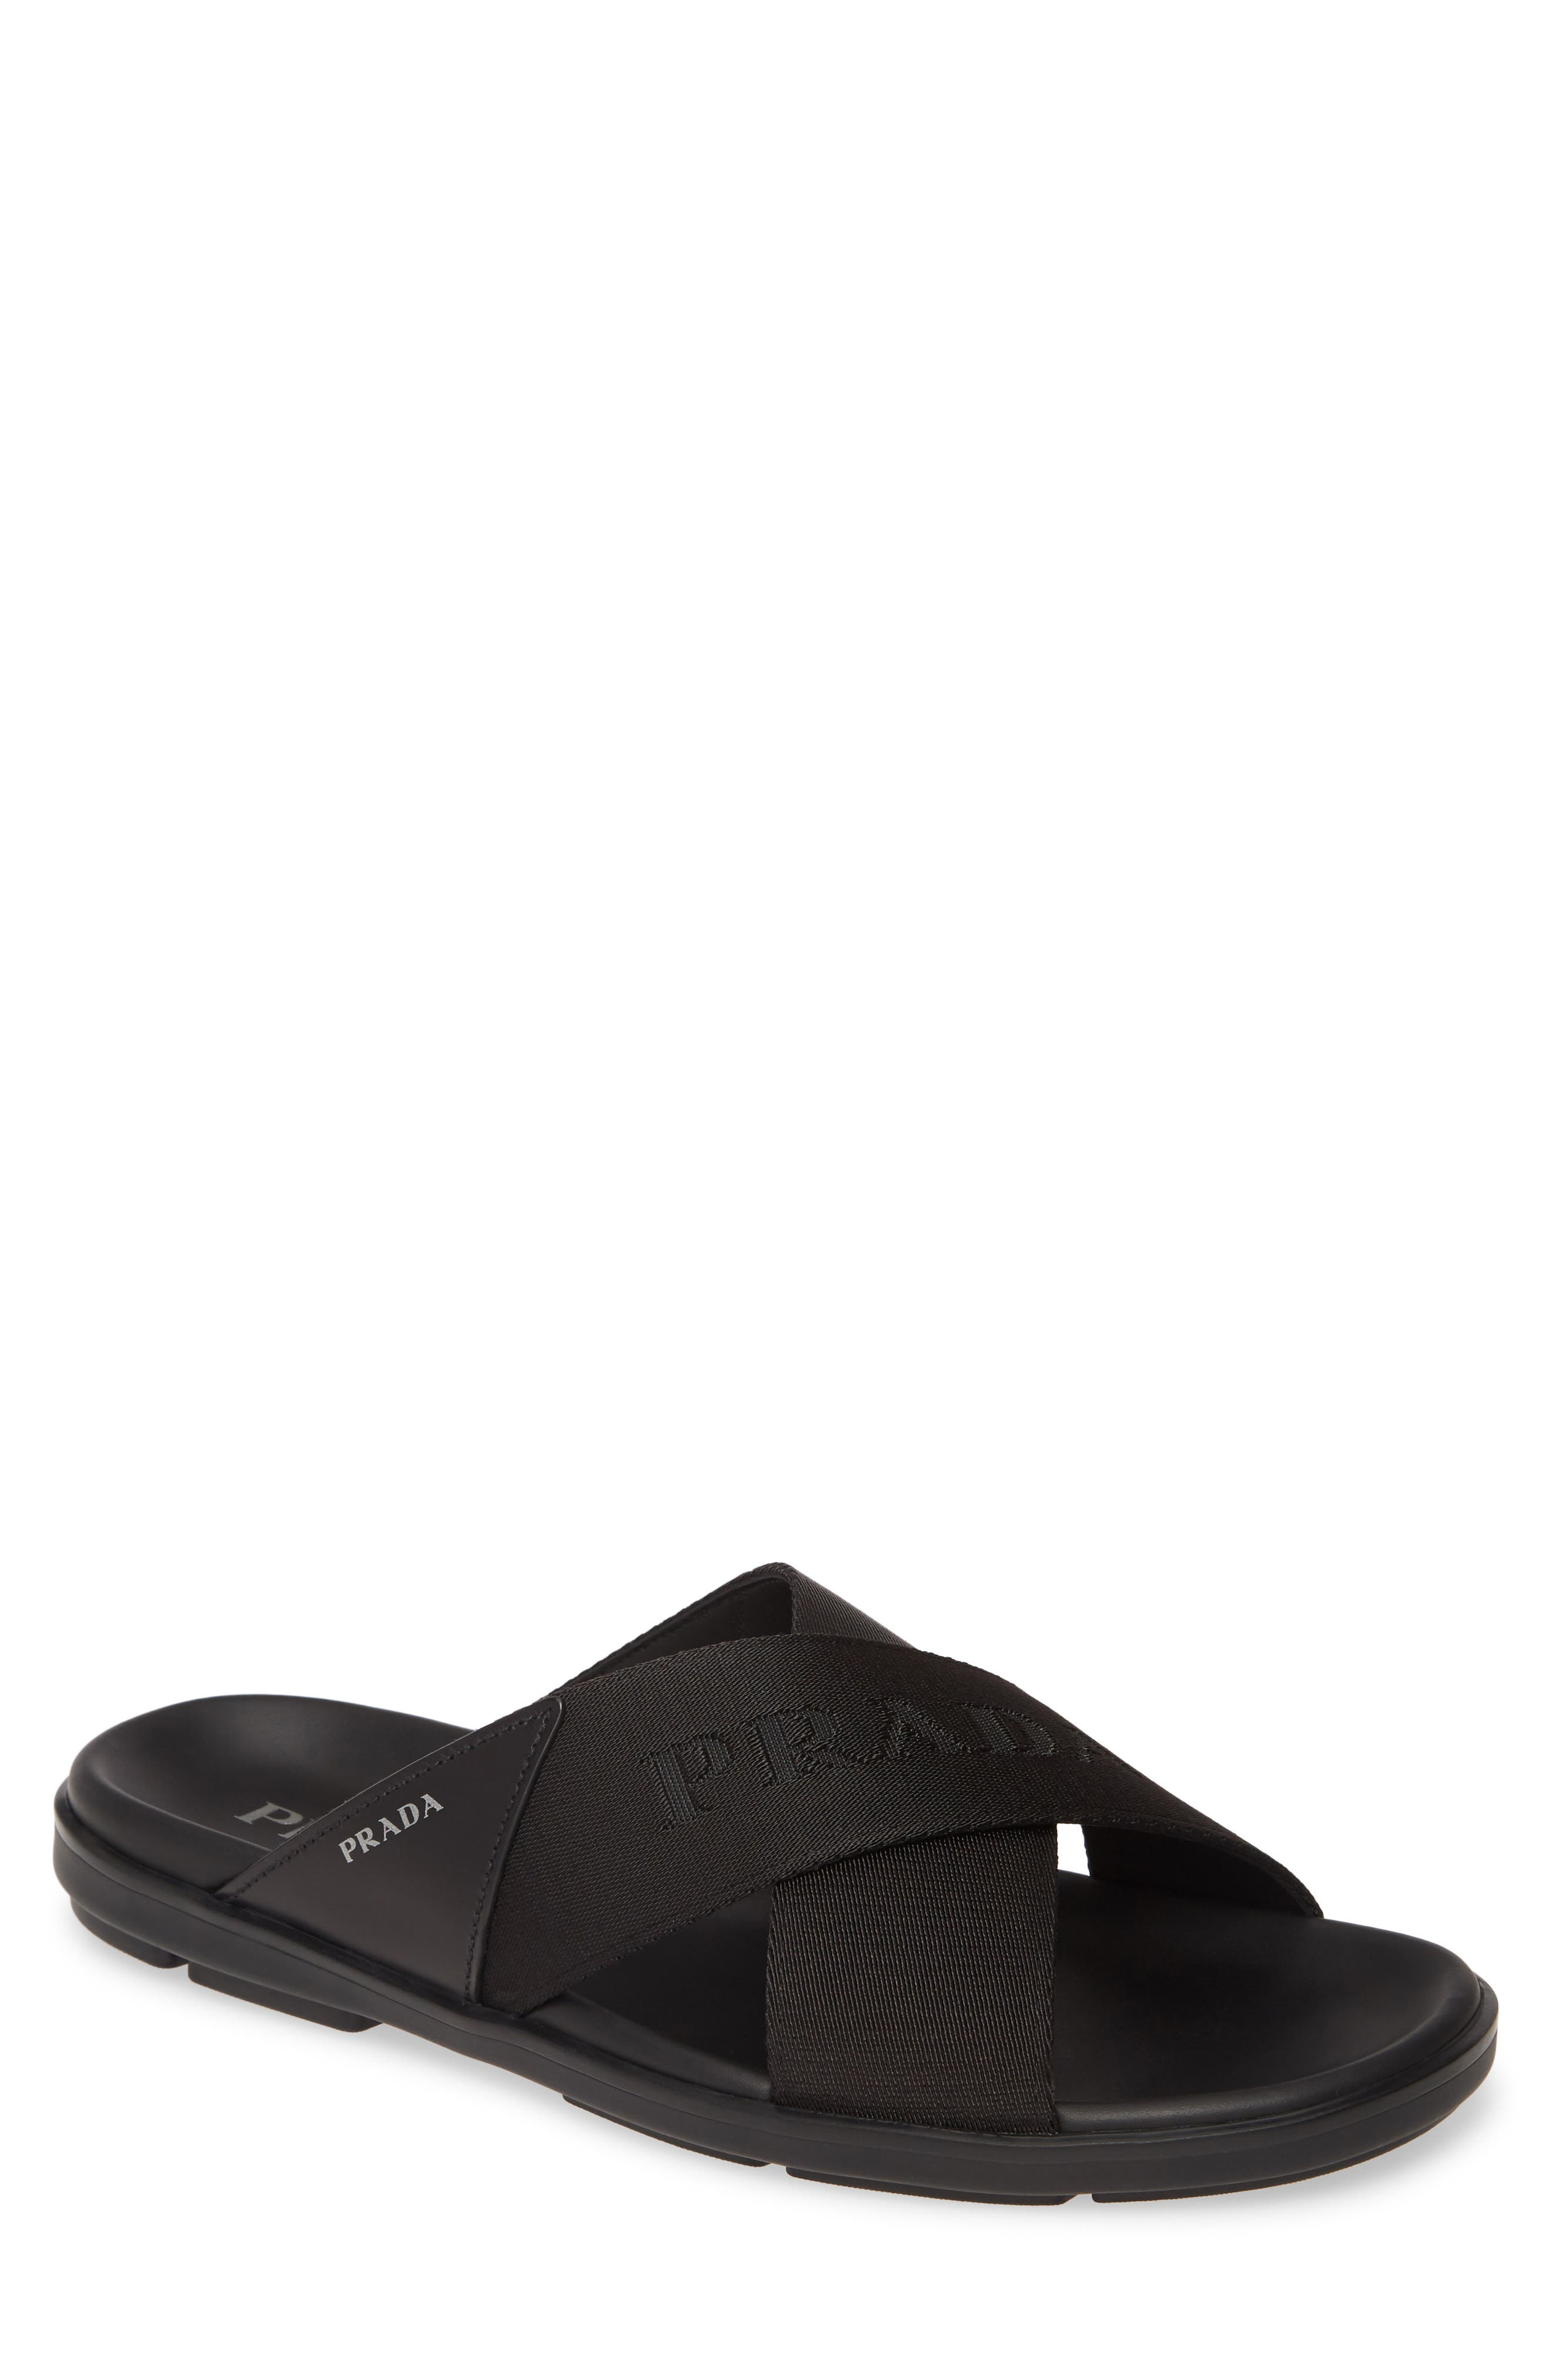 Men's Prada Sandals, Slides \u0026 Flip